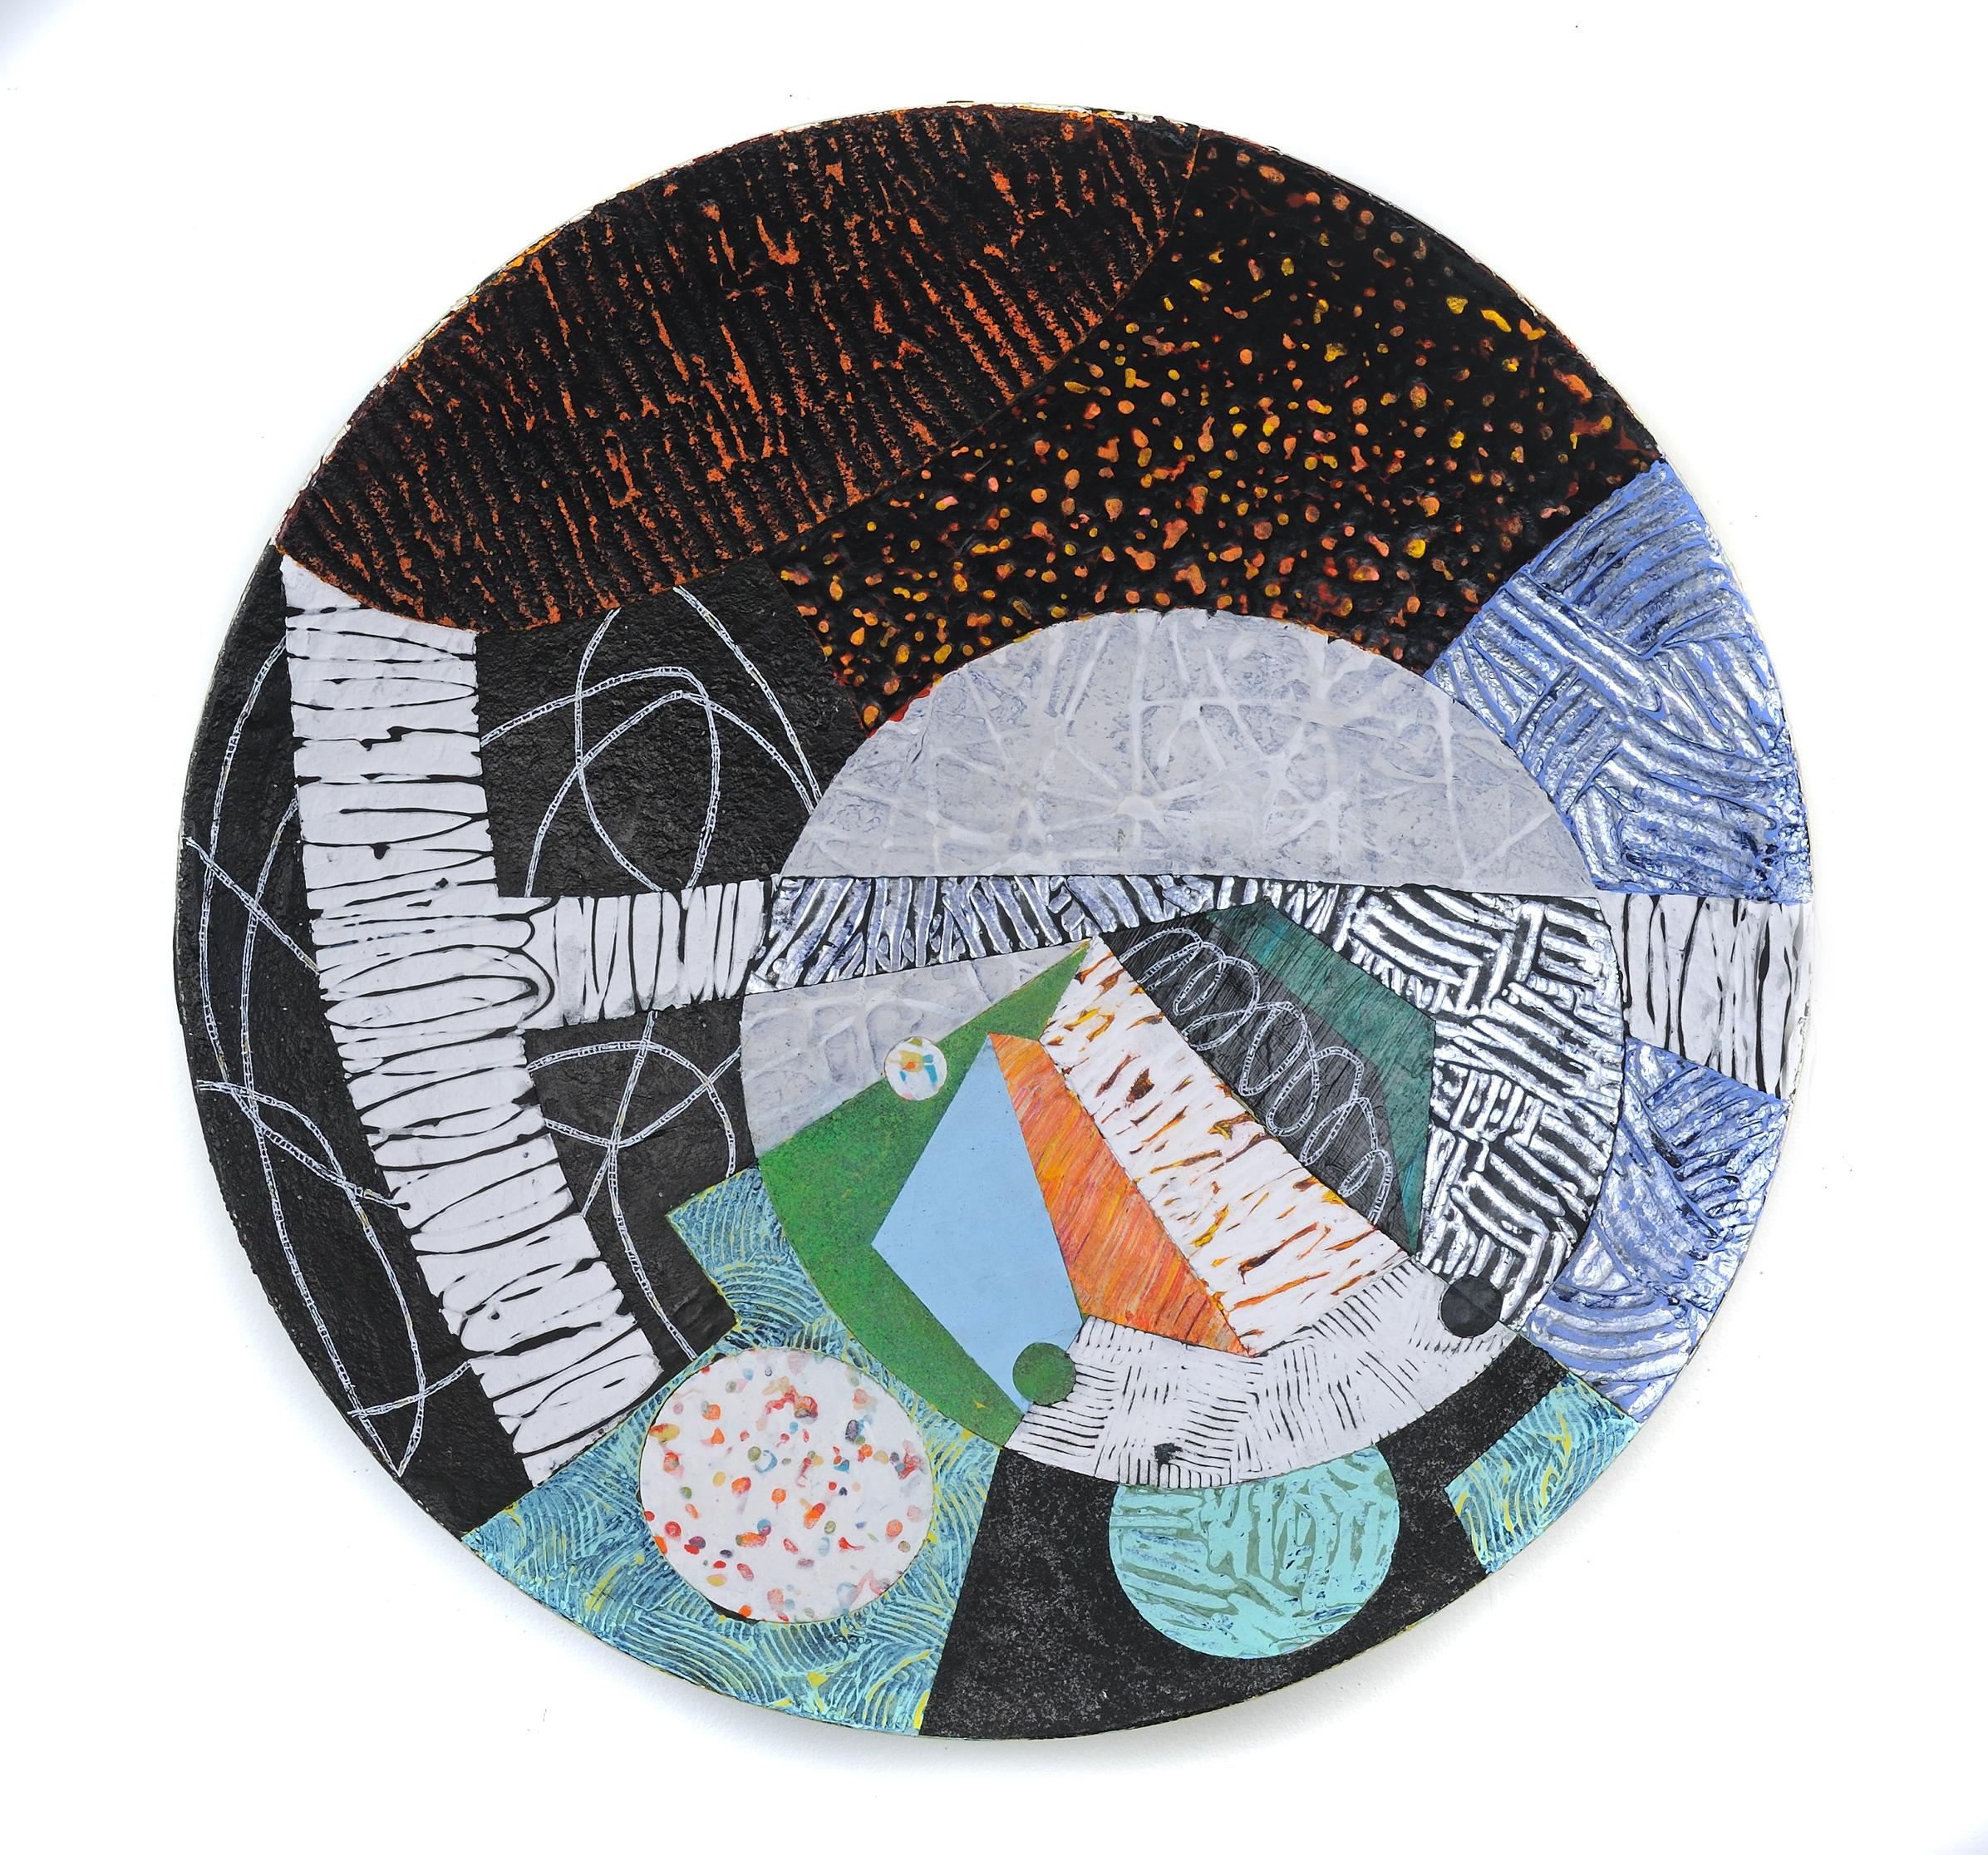 "Vessel #3, multicolored mixed media sculptural piece, textured, 22"" diameter"